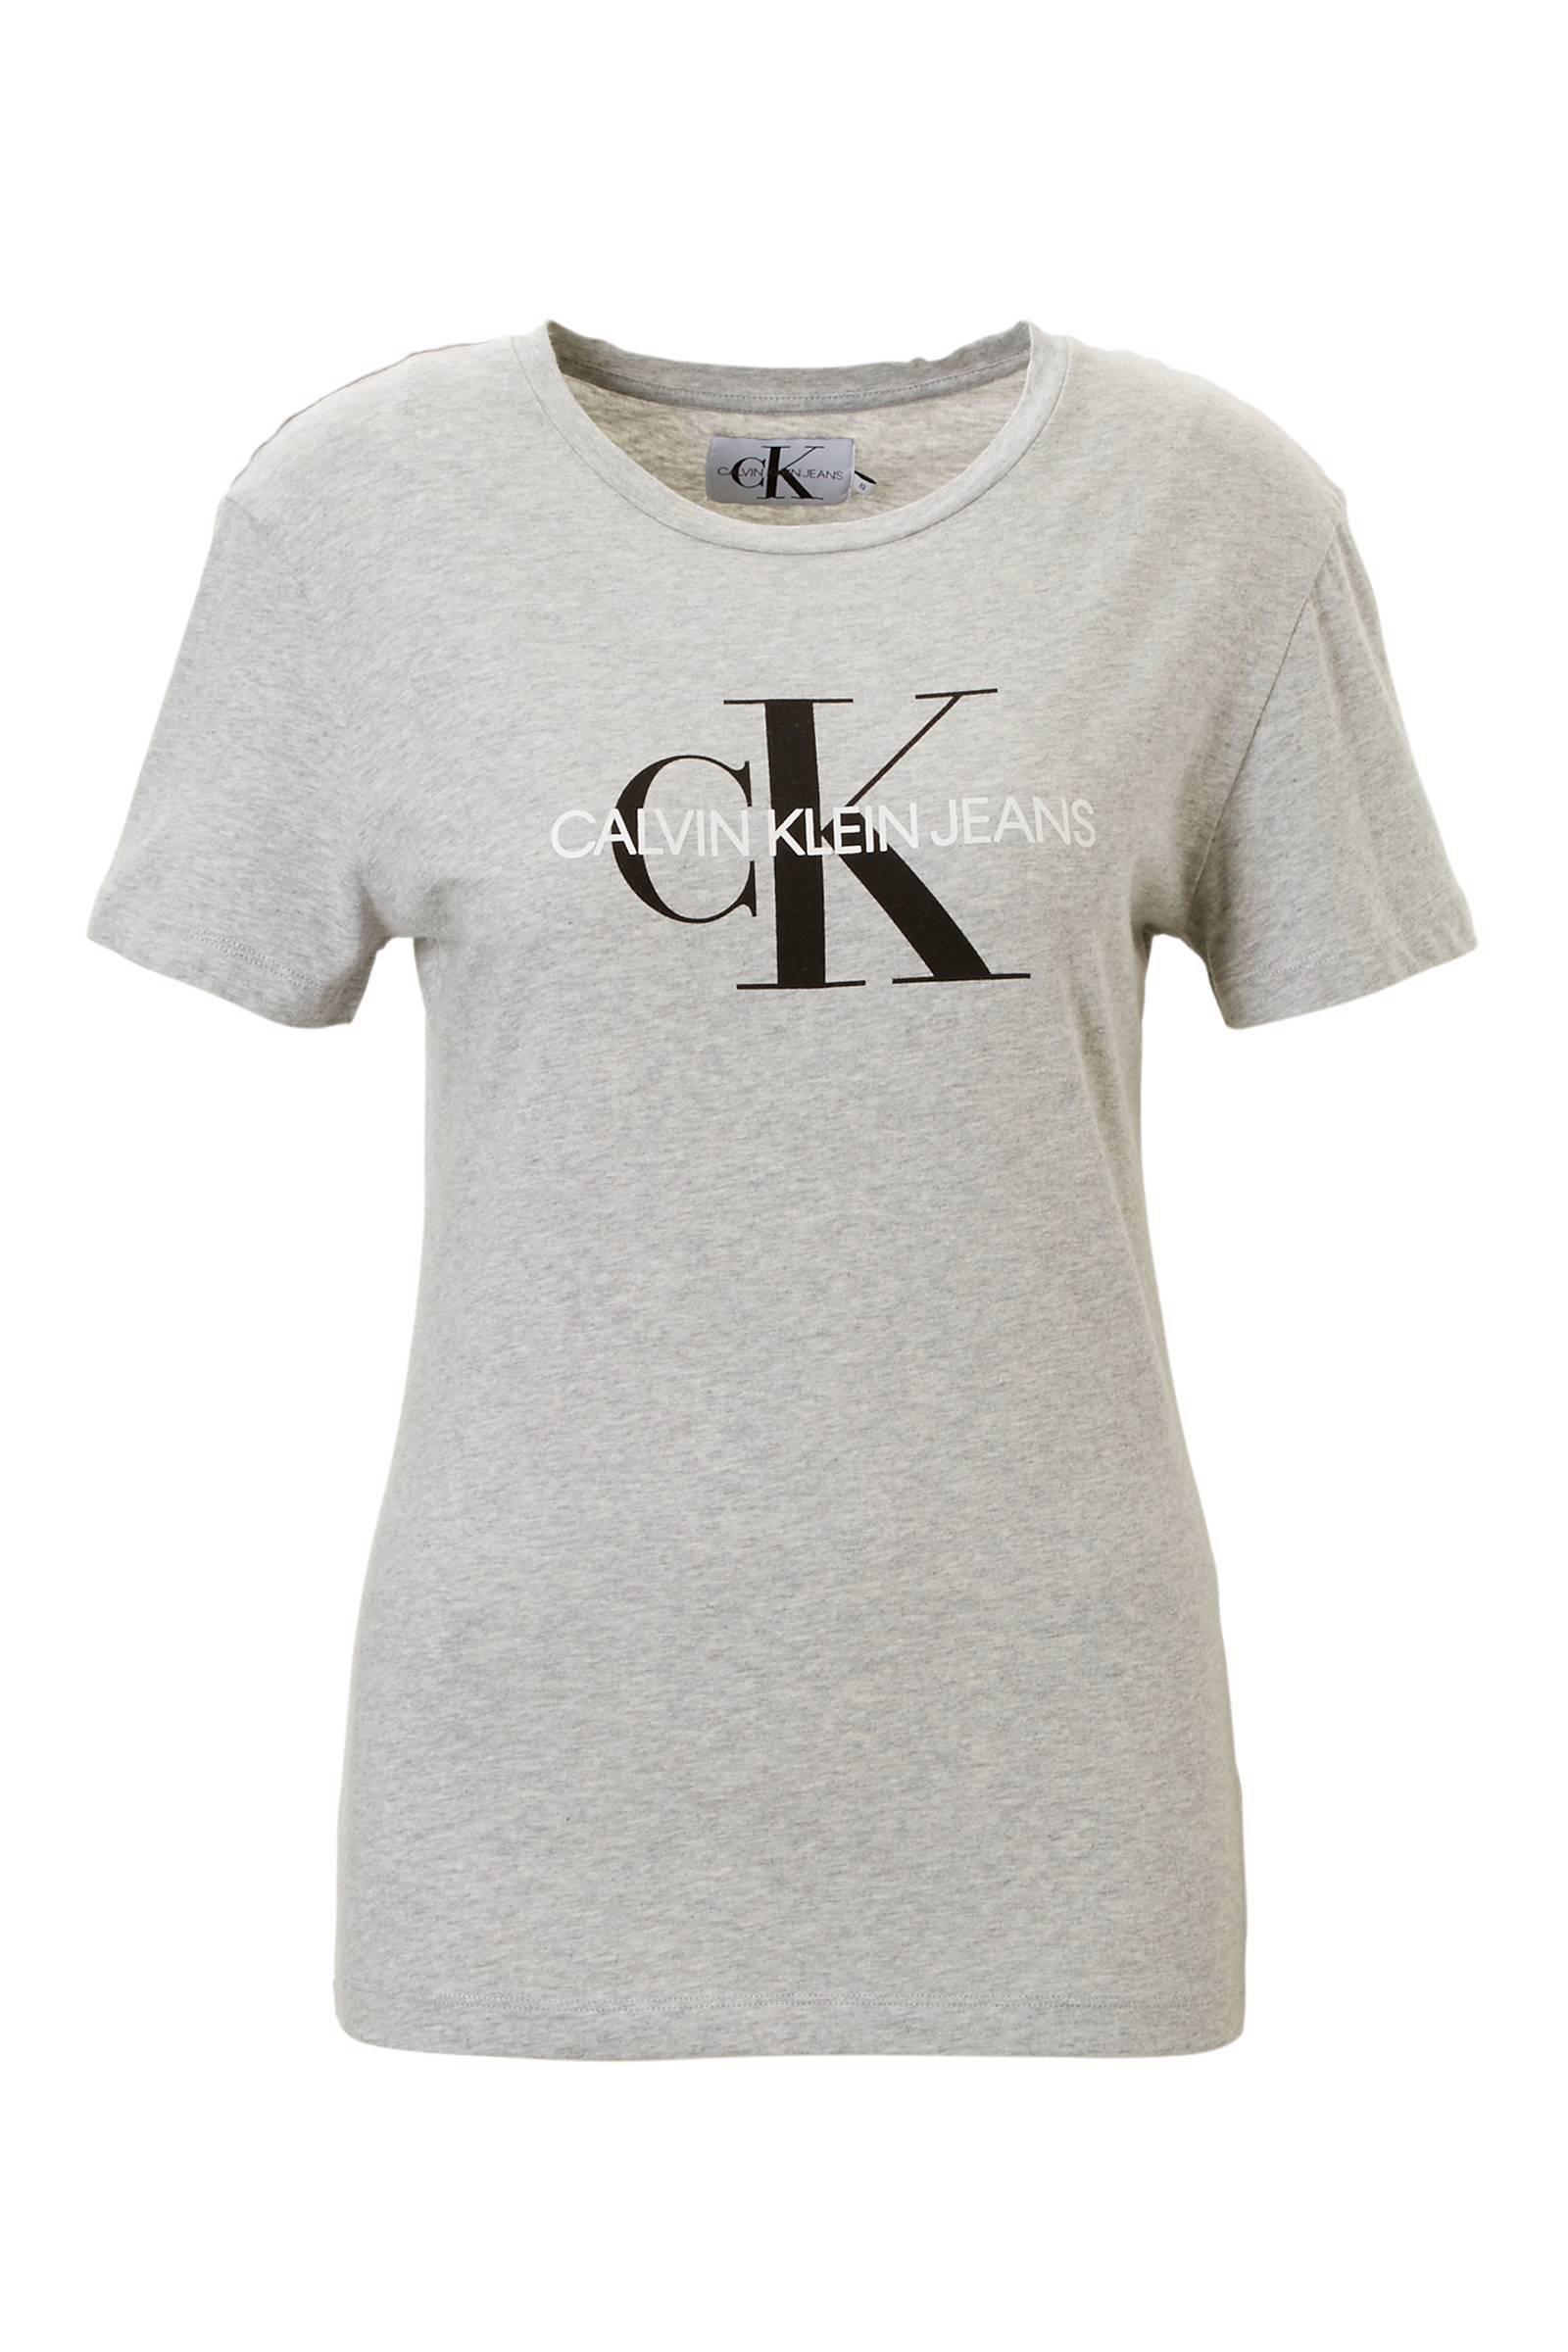 calvin klein shirt dames grijs